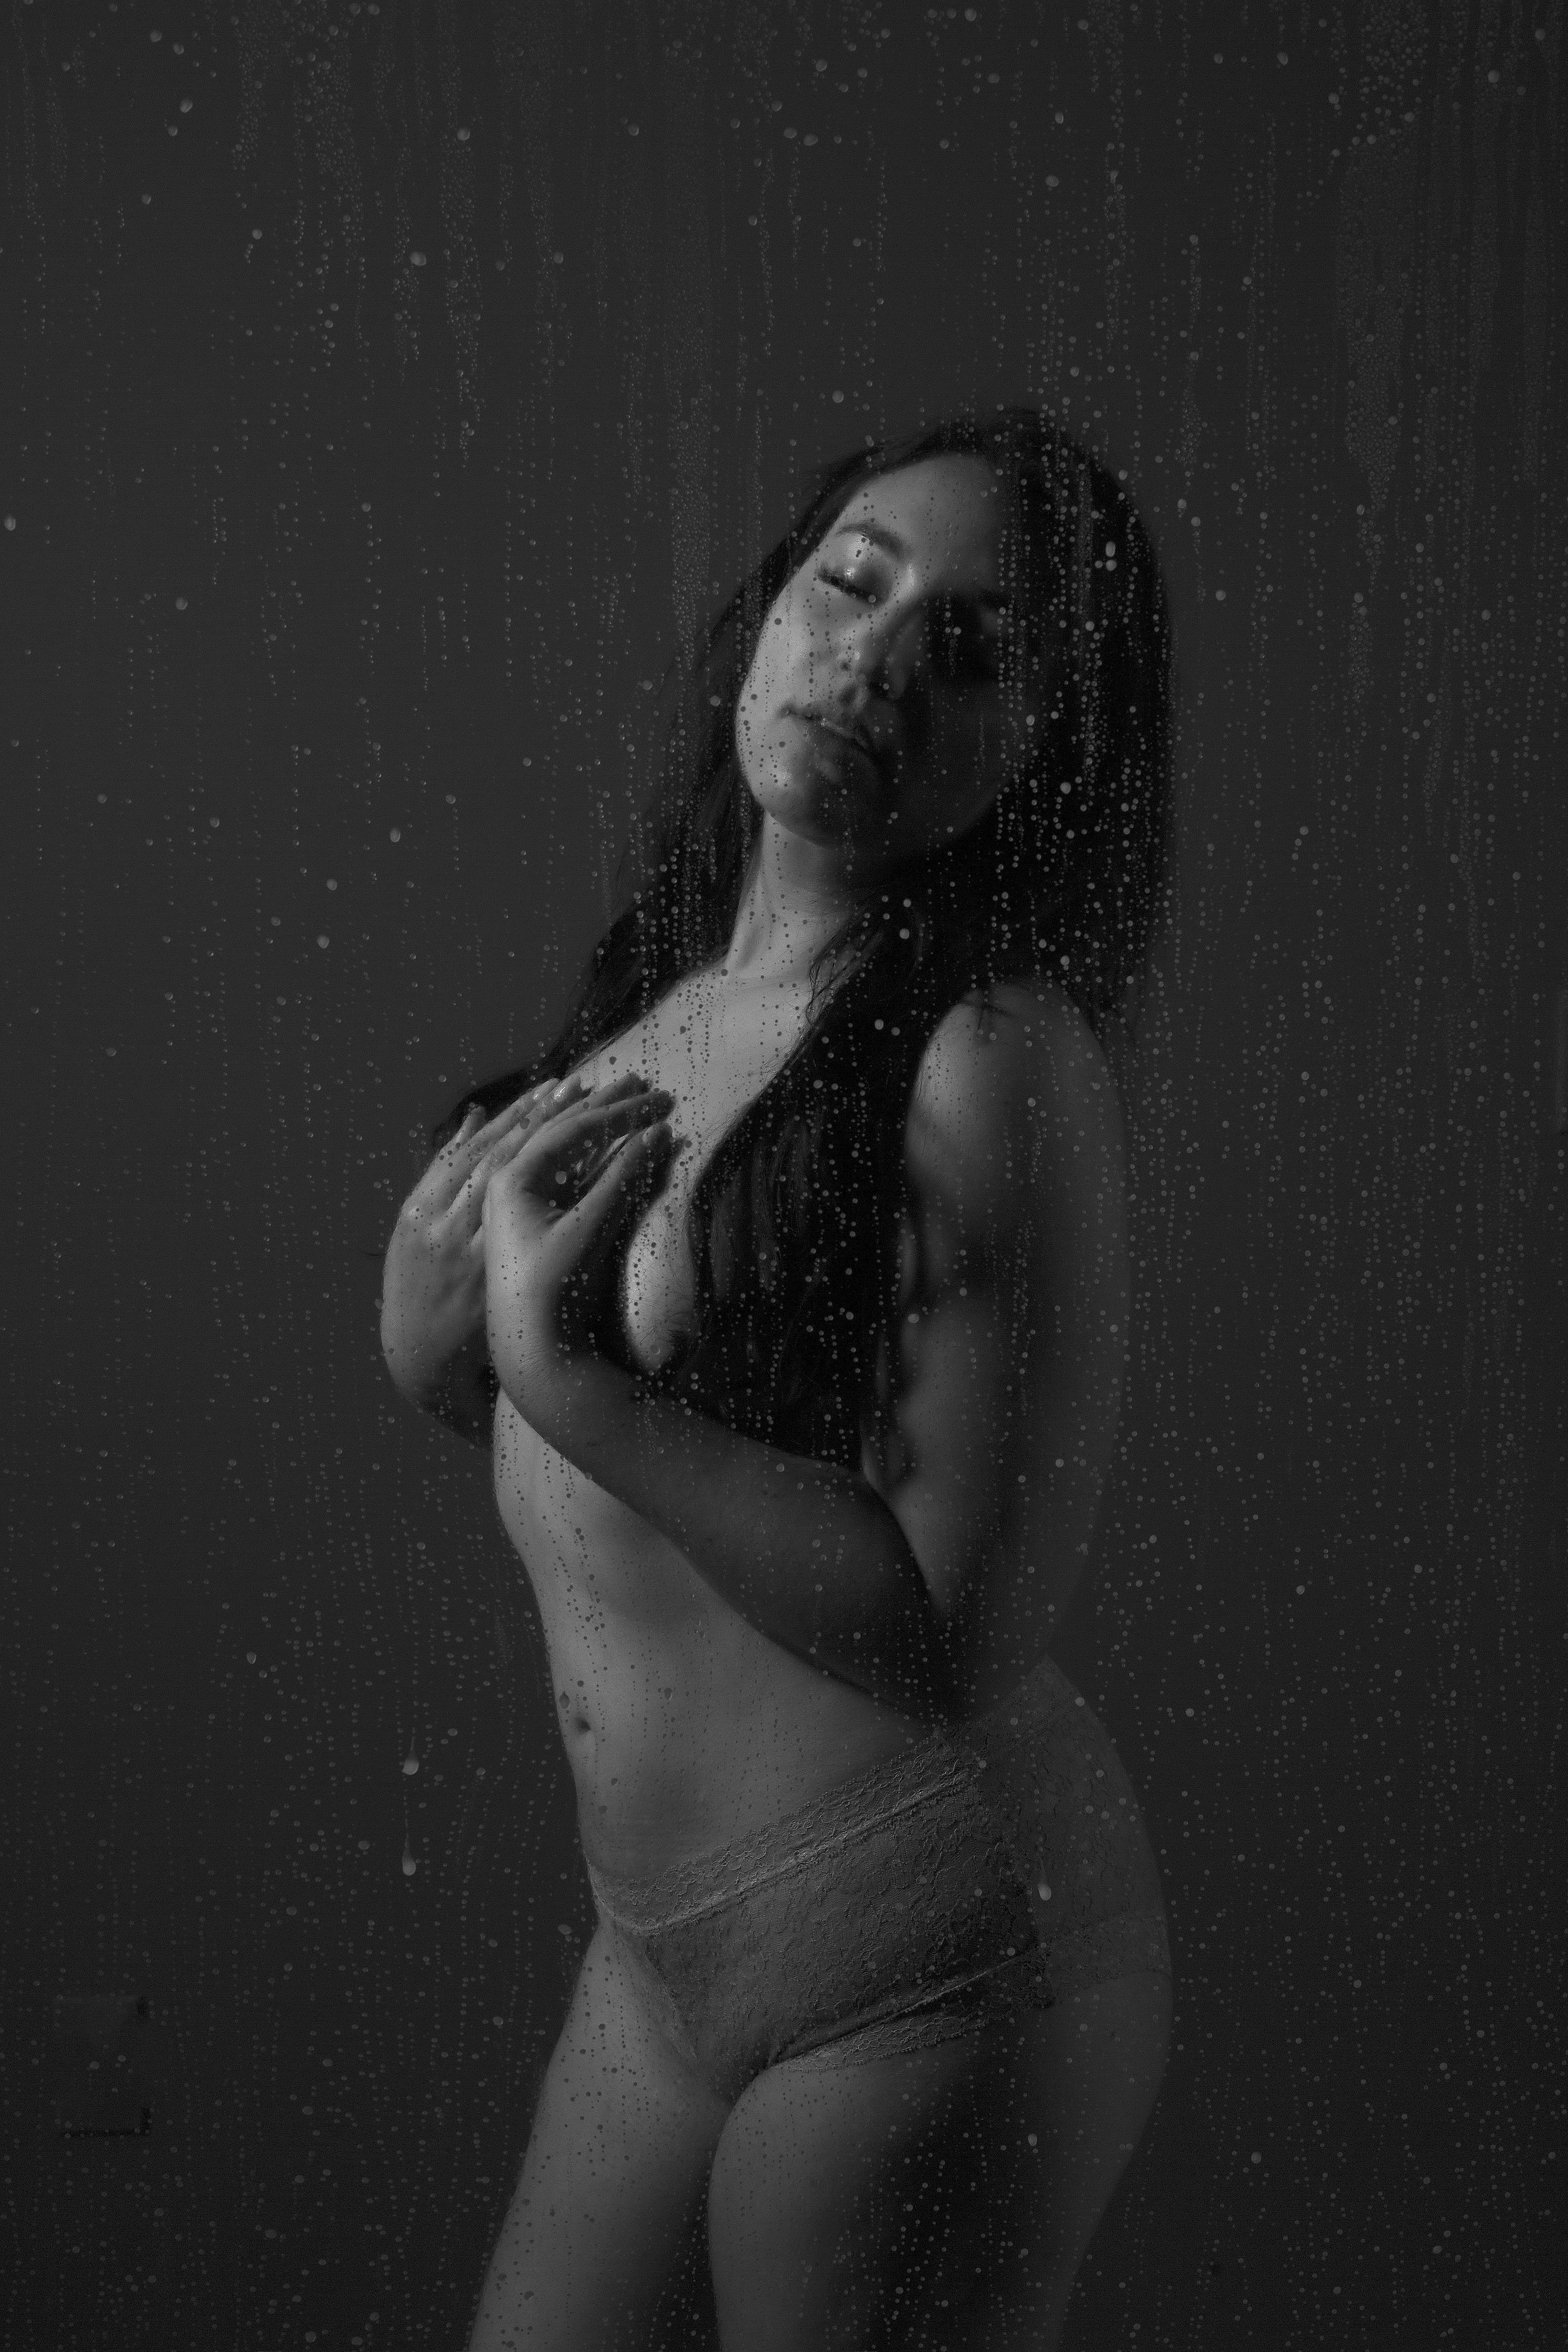 DanielaB Shower 06 APPROVED.jpg